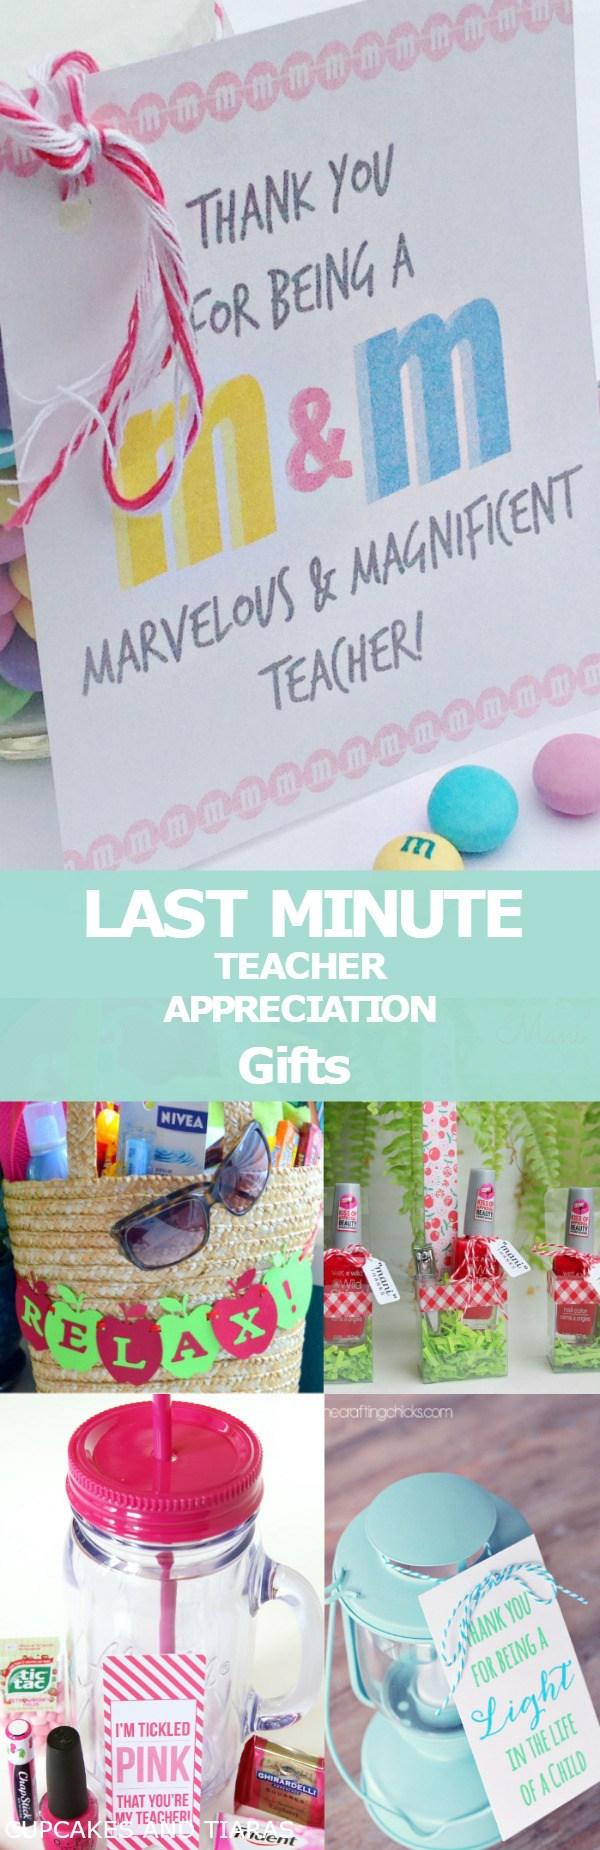 Last Minute Teacher Appreciation Gift Ideas Cupcakes And Tiaras Teacher Appreciation Gifts Appreciation Gifts Teacher Christmas Gifts